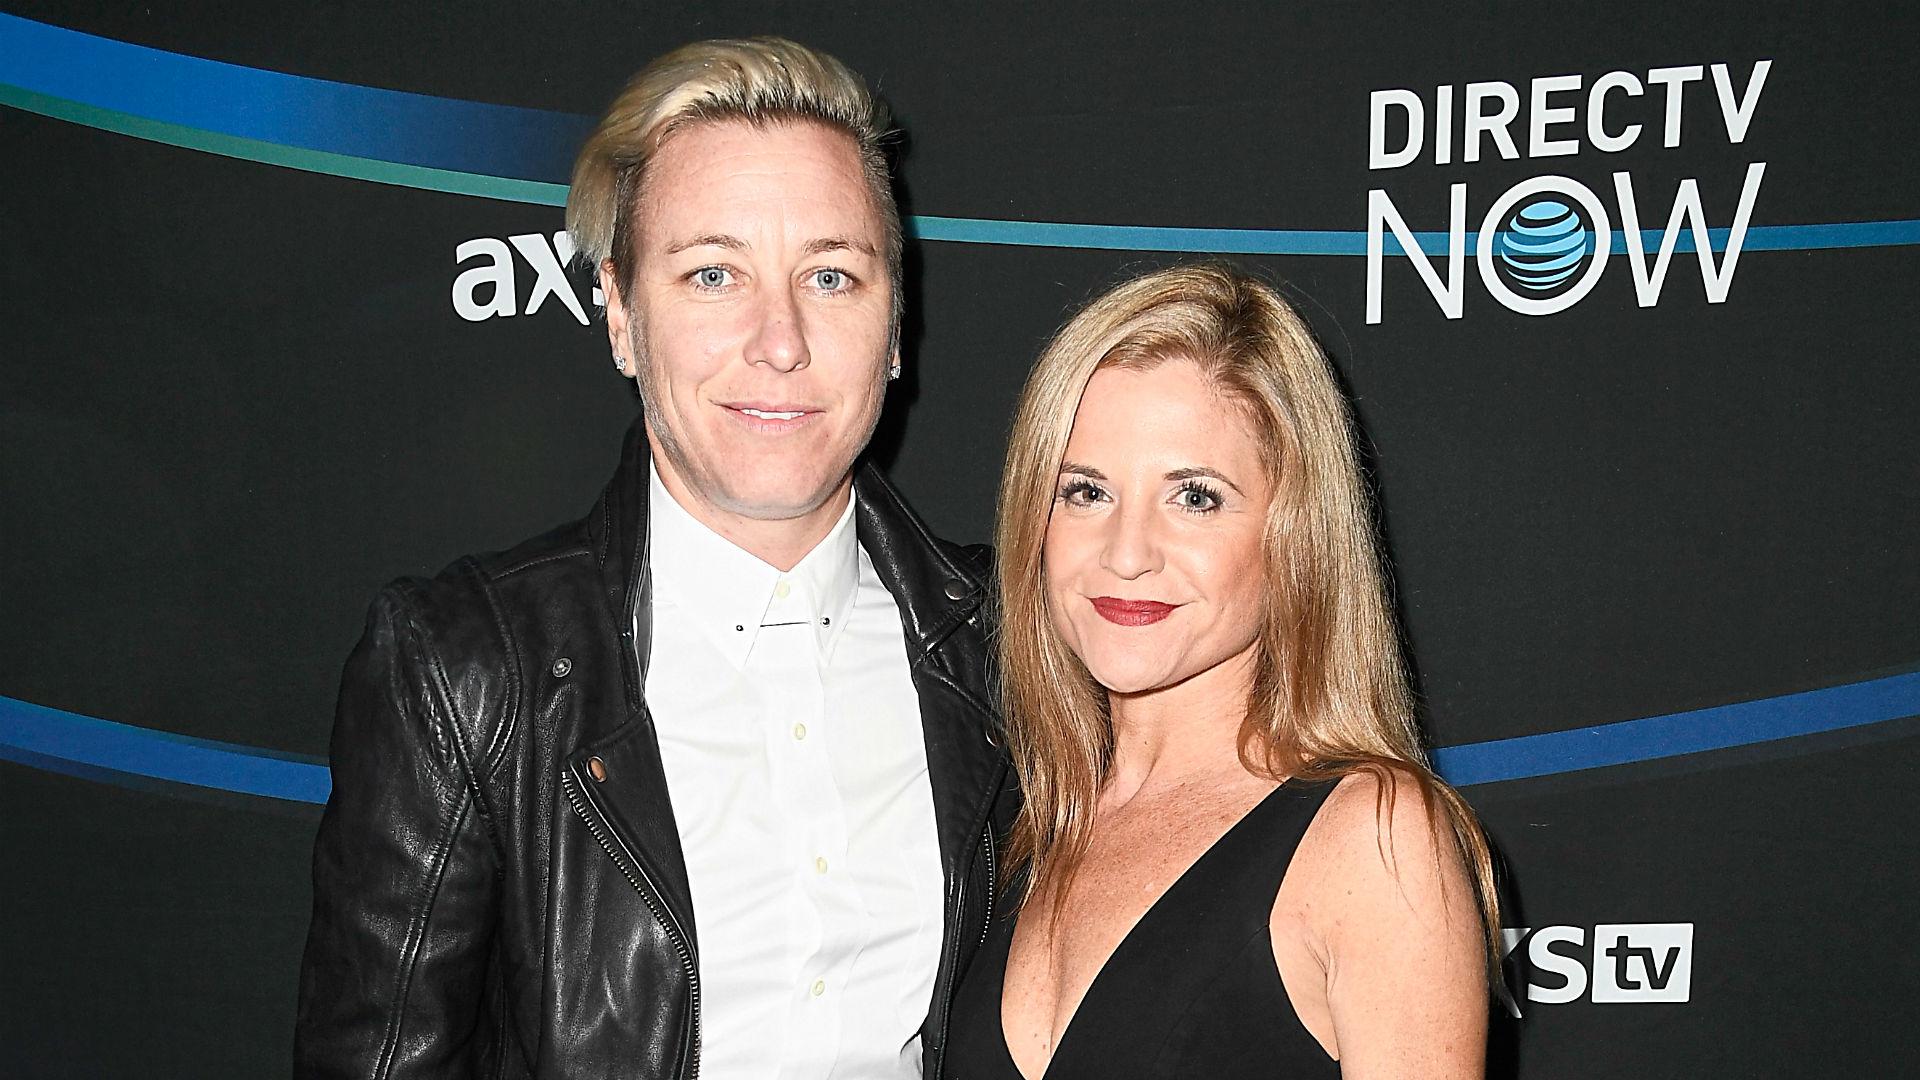 Soccer Pro Abby Wambach is Engaged to Christian Blogger Glennon Doyle Melton!